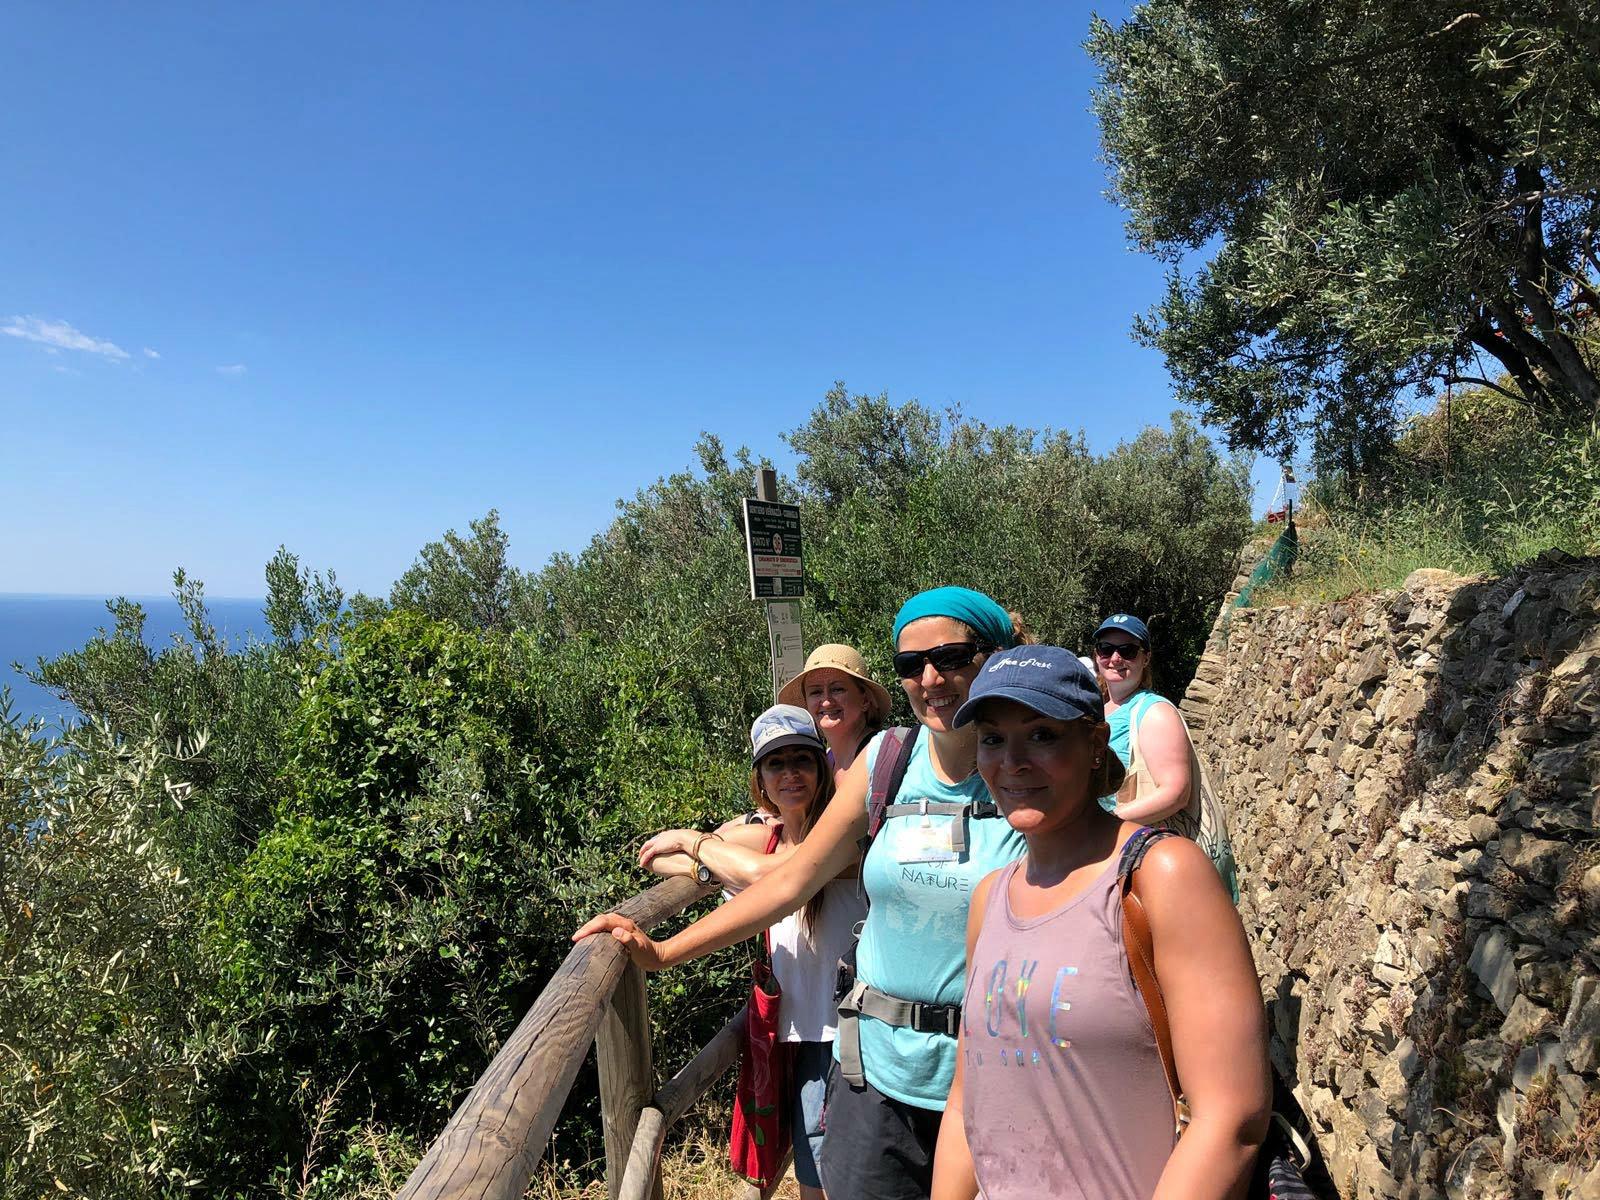 hiking-group.jpg